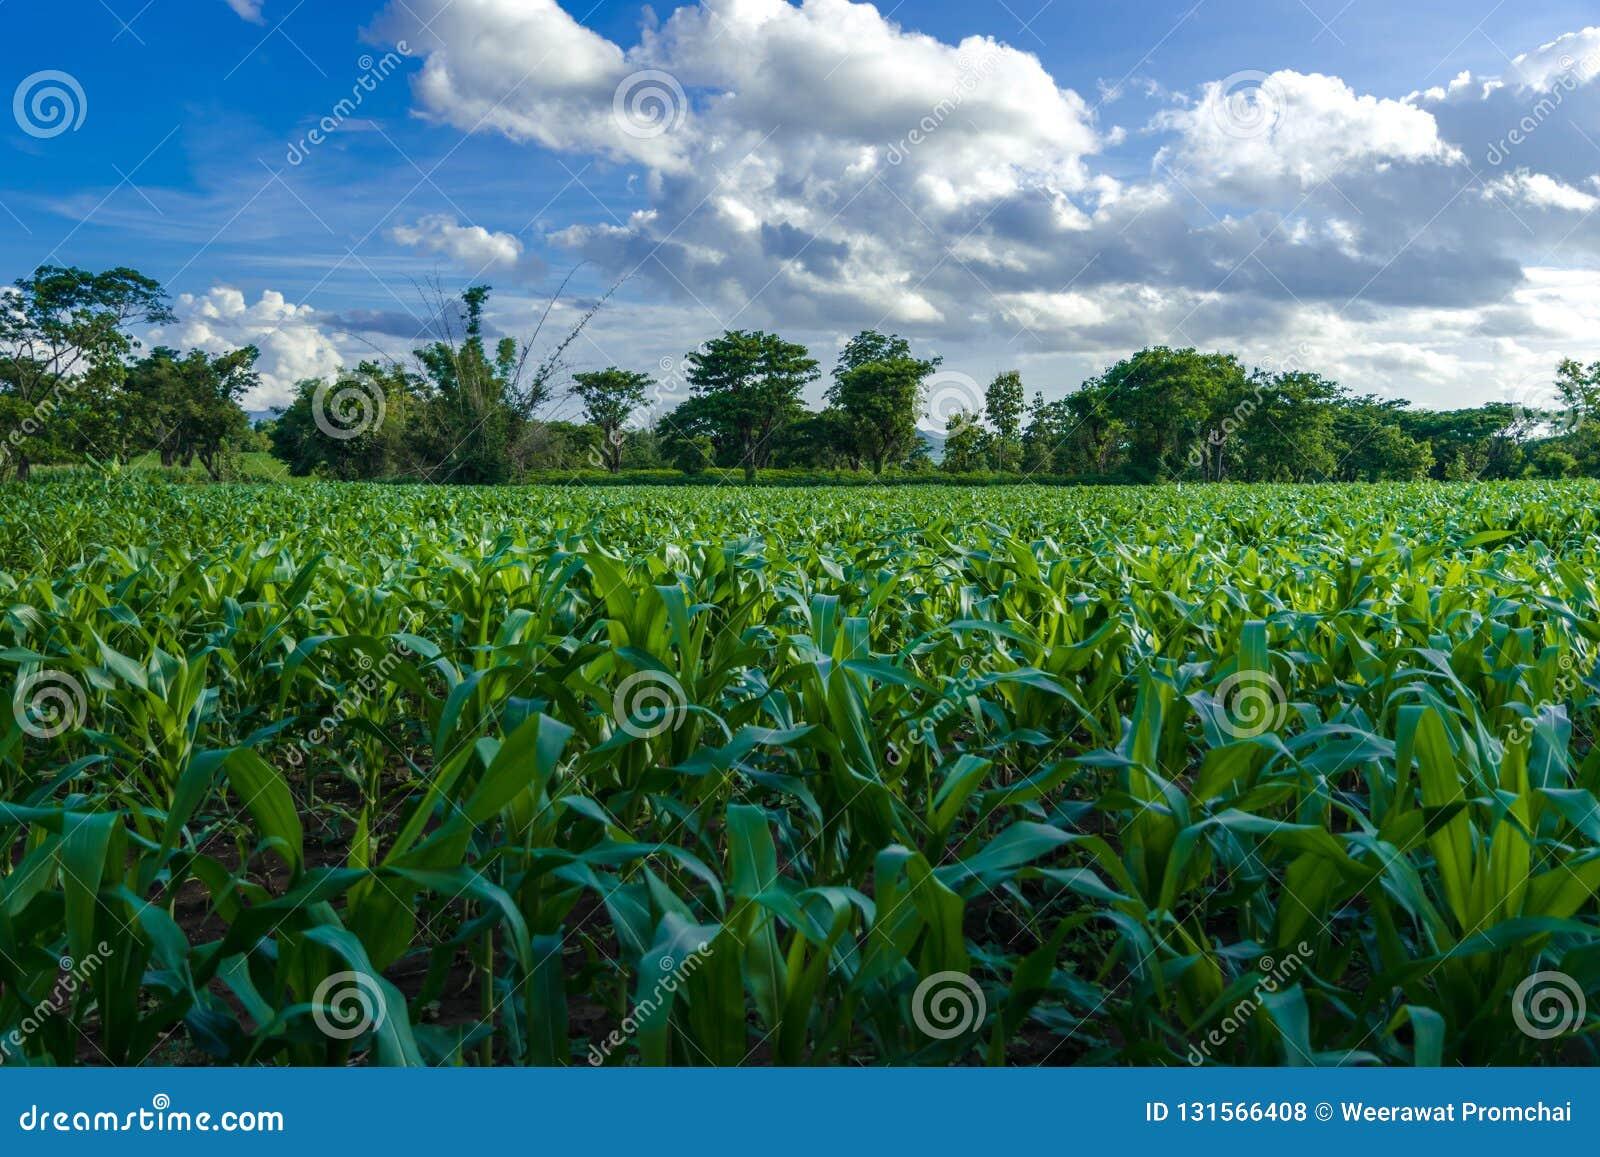 Ферма мозоли и ясное голубое небо